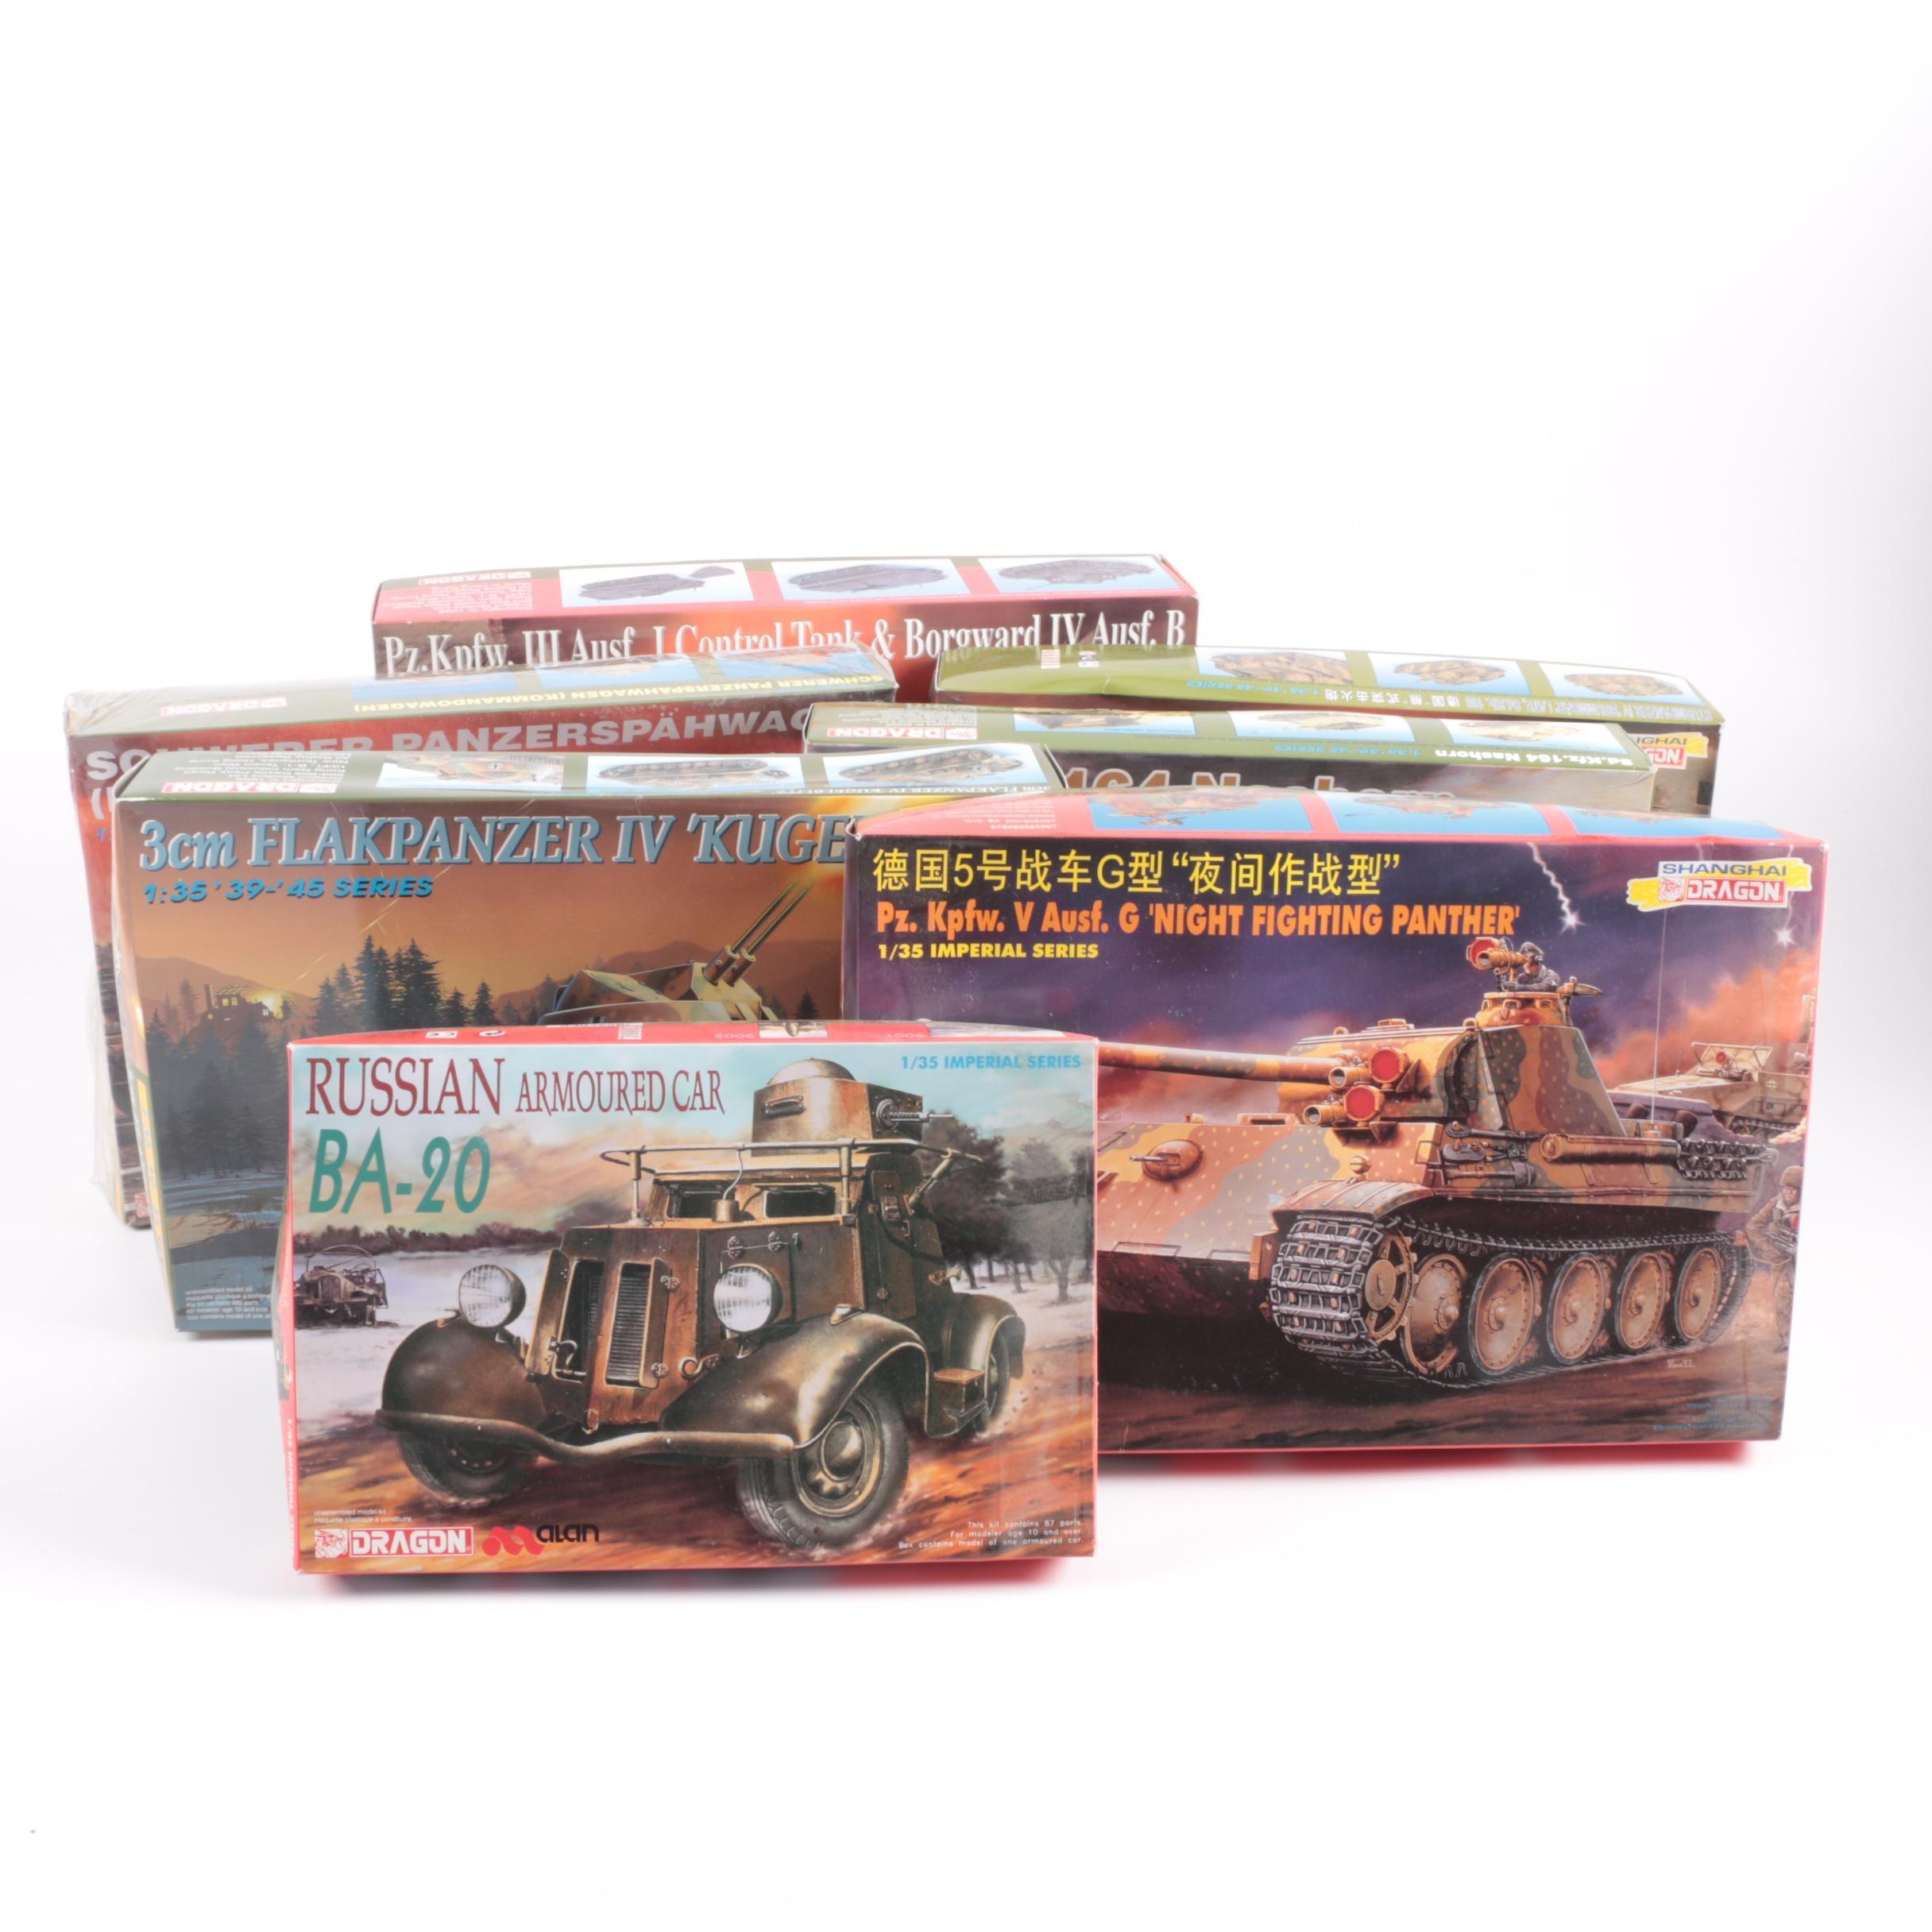 Dragon 1/35 Military Model Kits